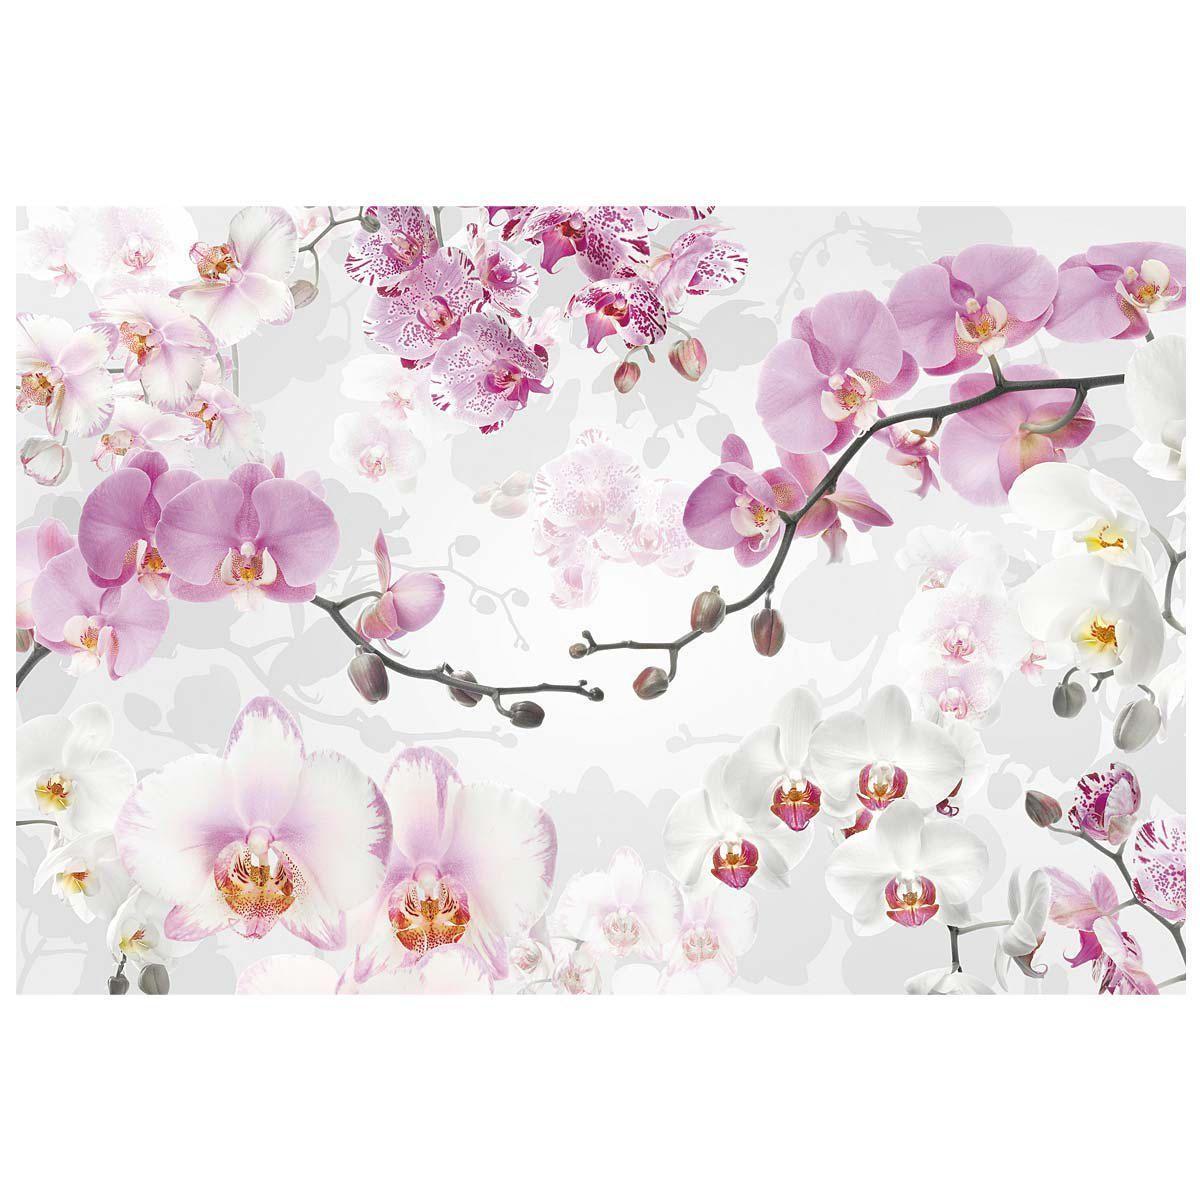 fototapete orchideen einfach geschenke. Black Bedroom Furniture Sets. Home Design Ideas